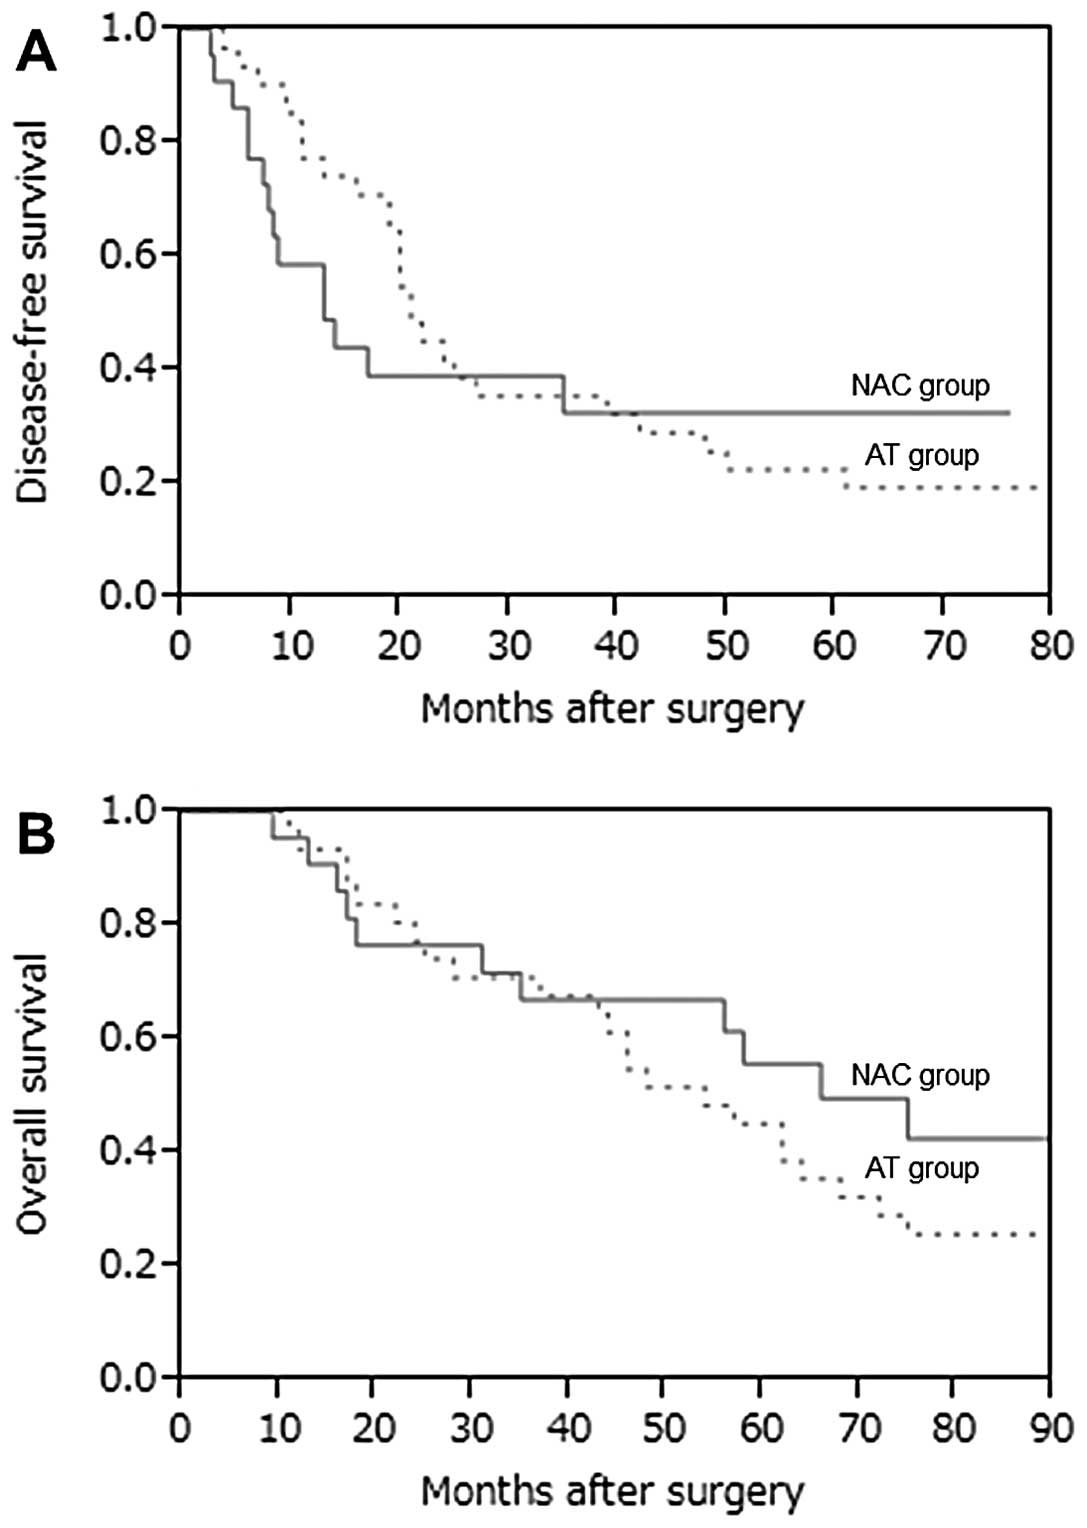 Breast cancer chemo regimens